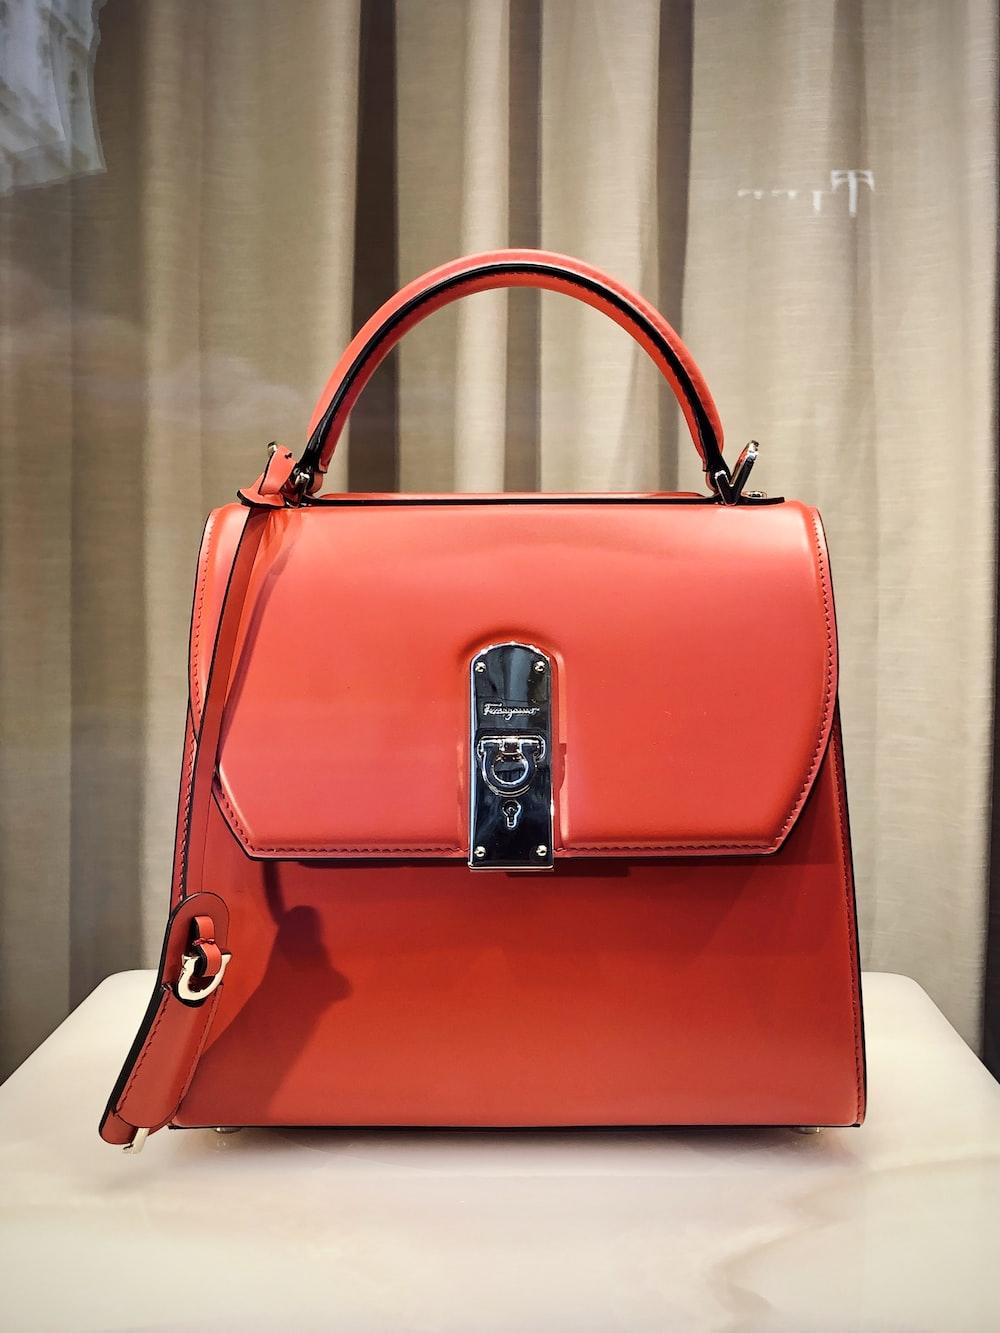 750 Handbag Pictures Free